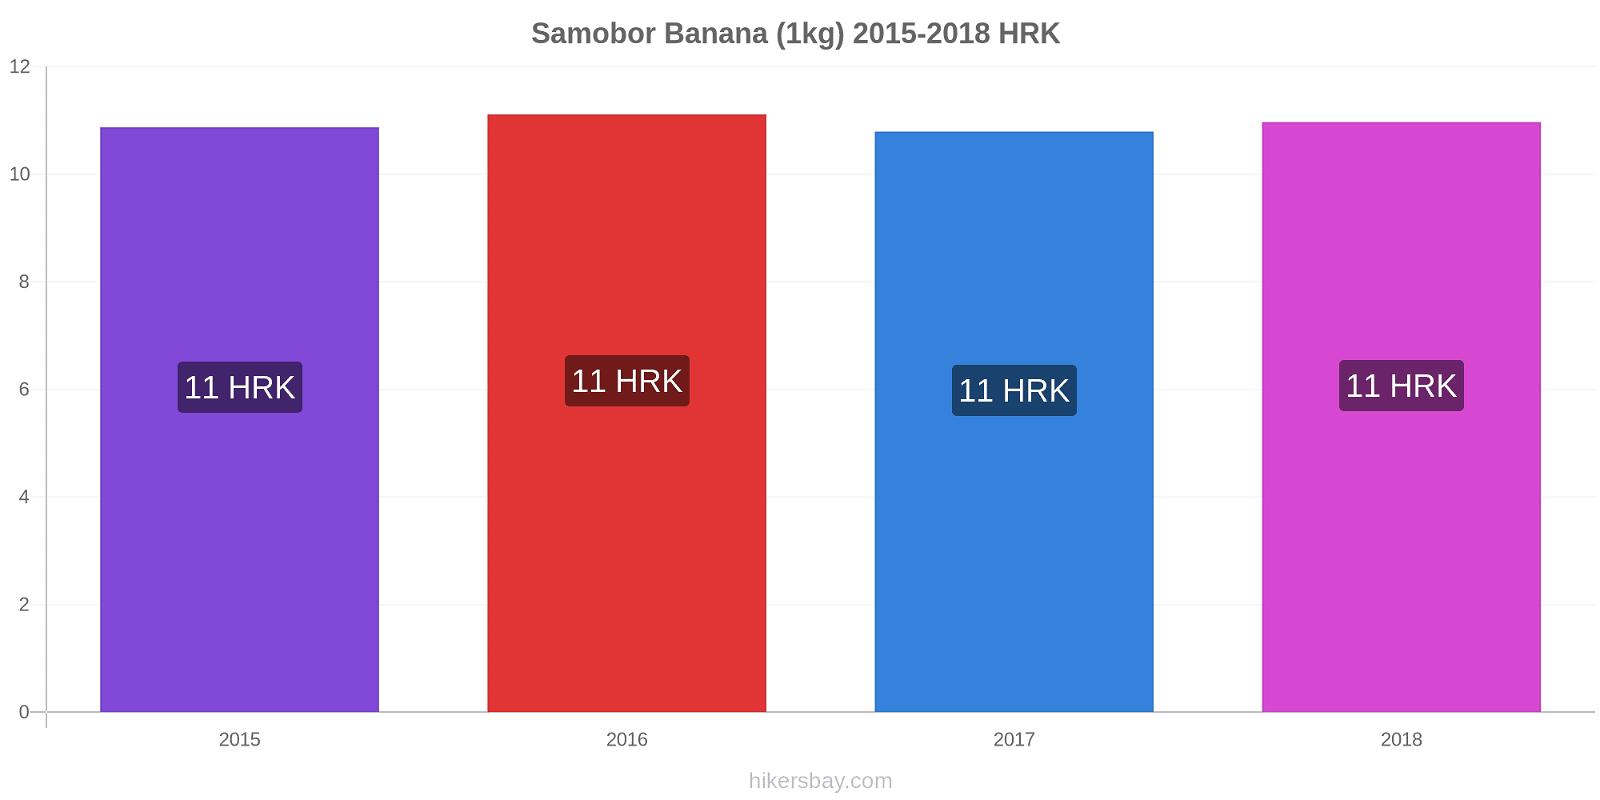 Samobor variazioni di prezzo Banana (1kg) hikersbay.com